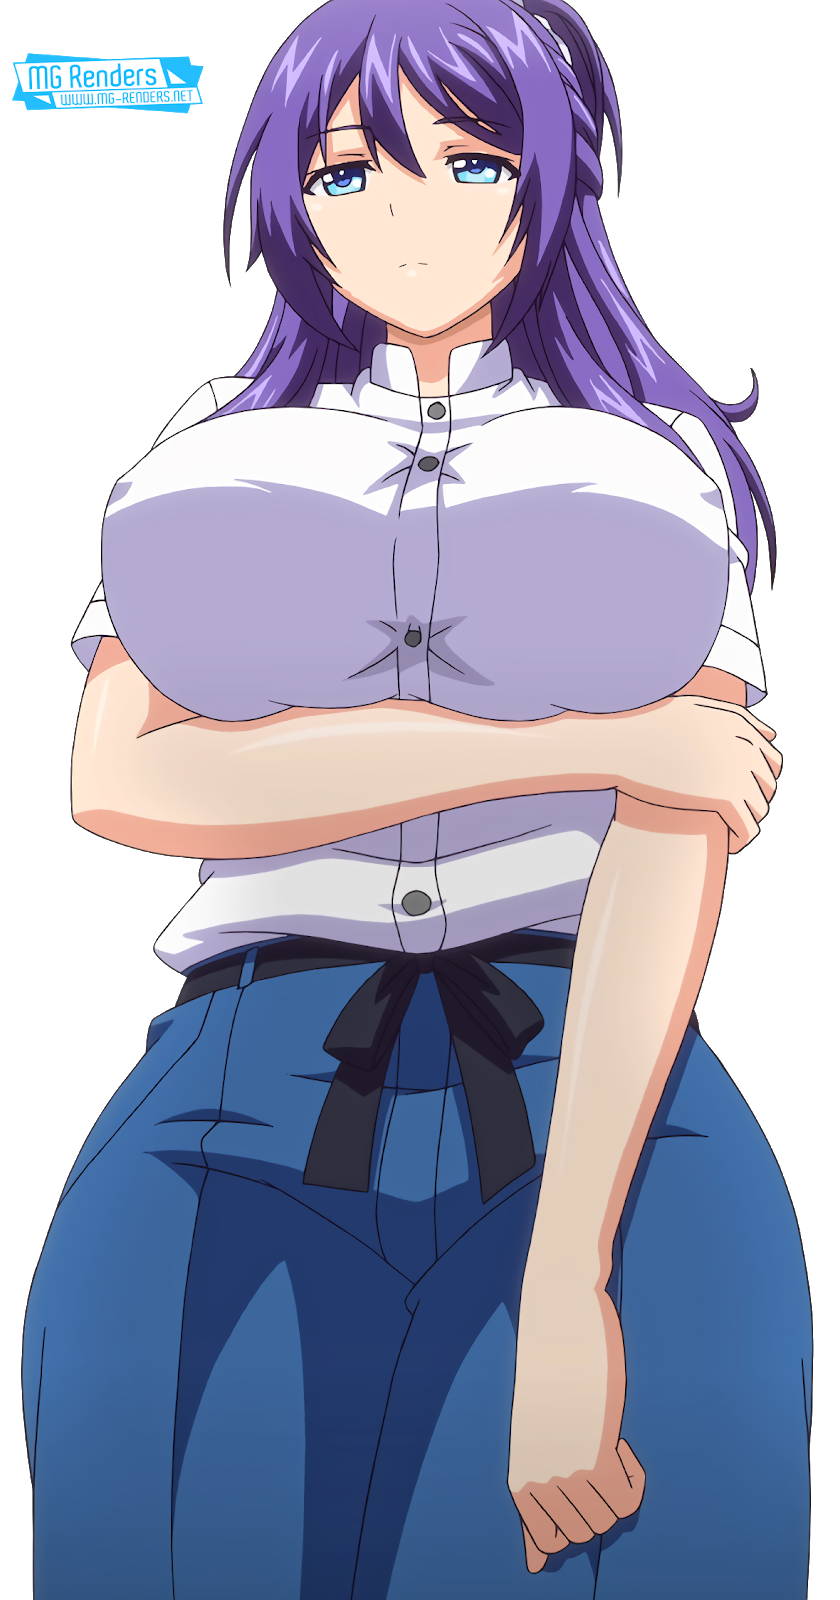 Tags: Render, Erect nipples, Huge Breasts, Large Breasts, Long hair, Mankitsu Happening, Purple hair, Suzukawa Rei